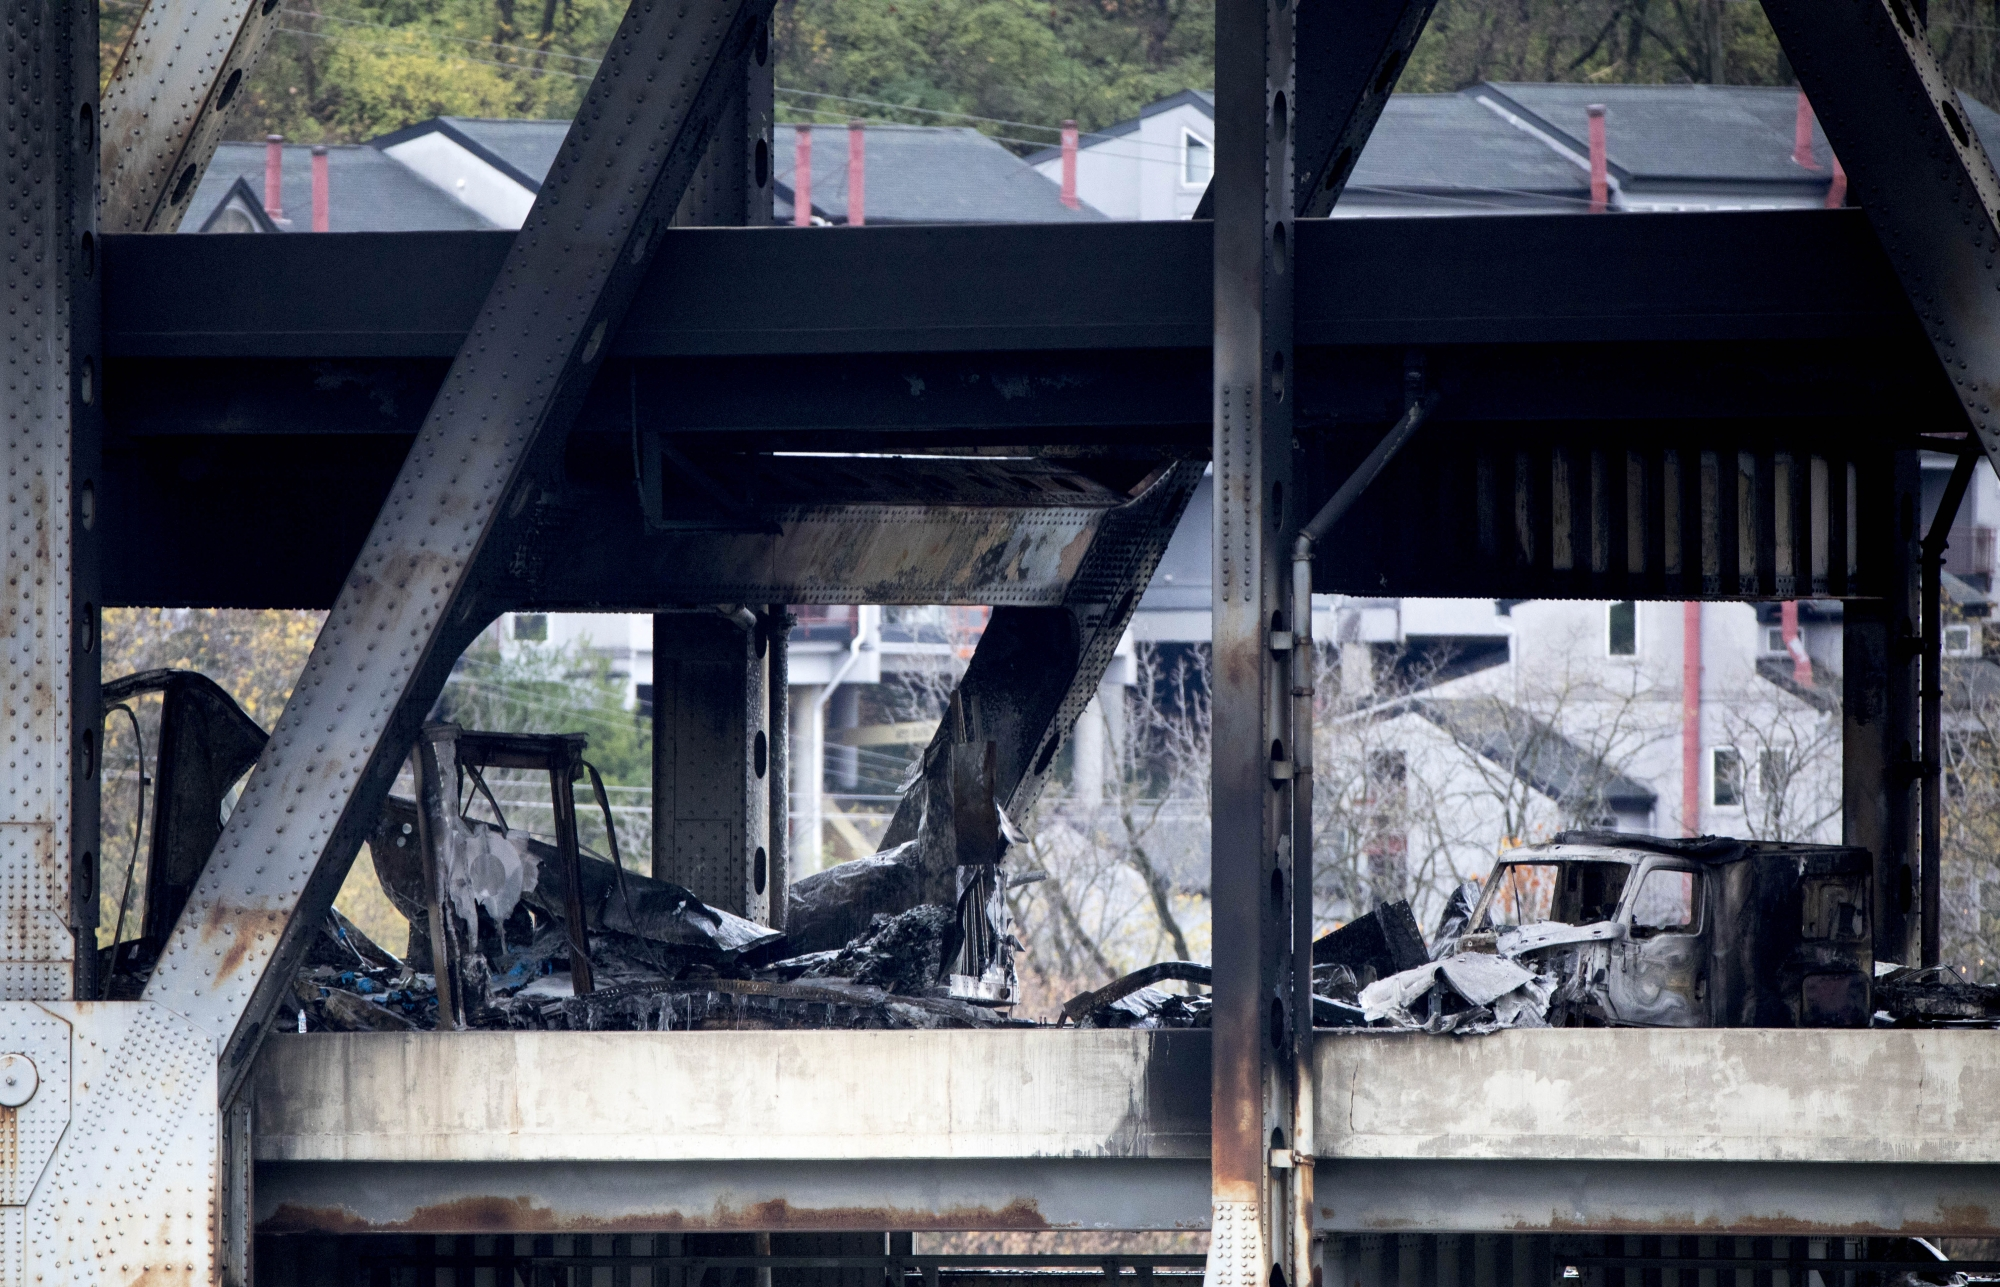 Fiery Crash Closes Bridge Linking Ohio Kentucky For Days Wtop